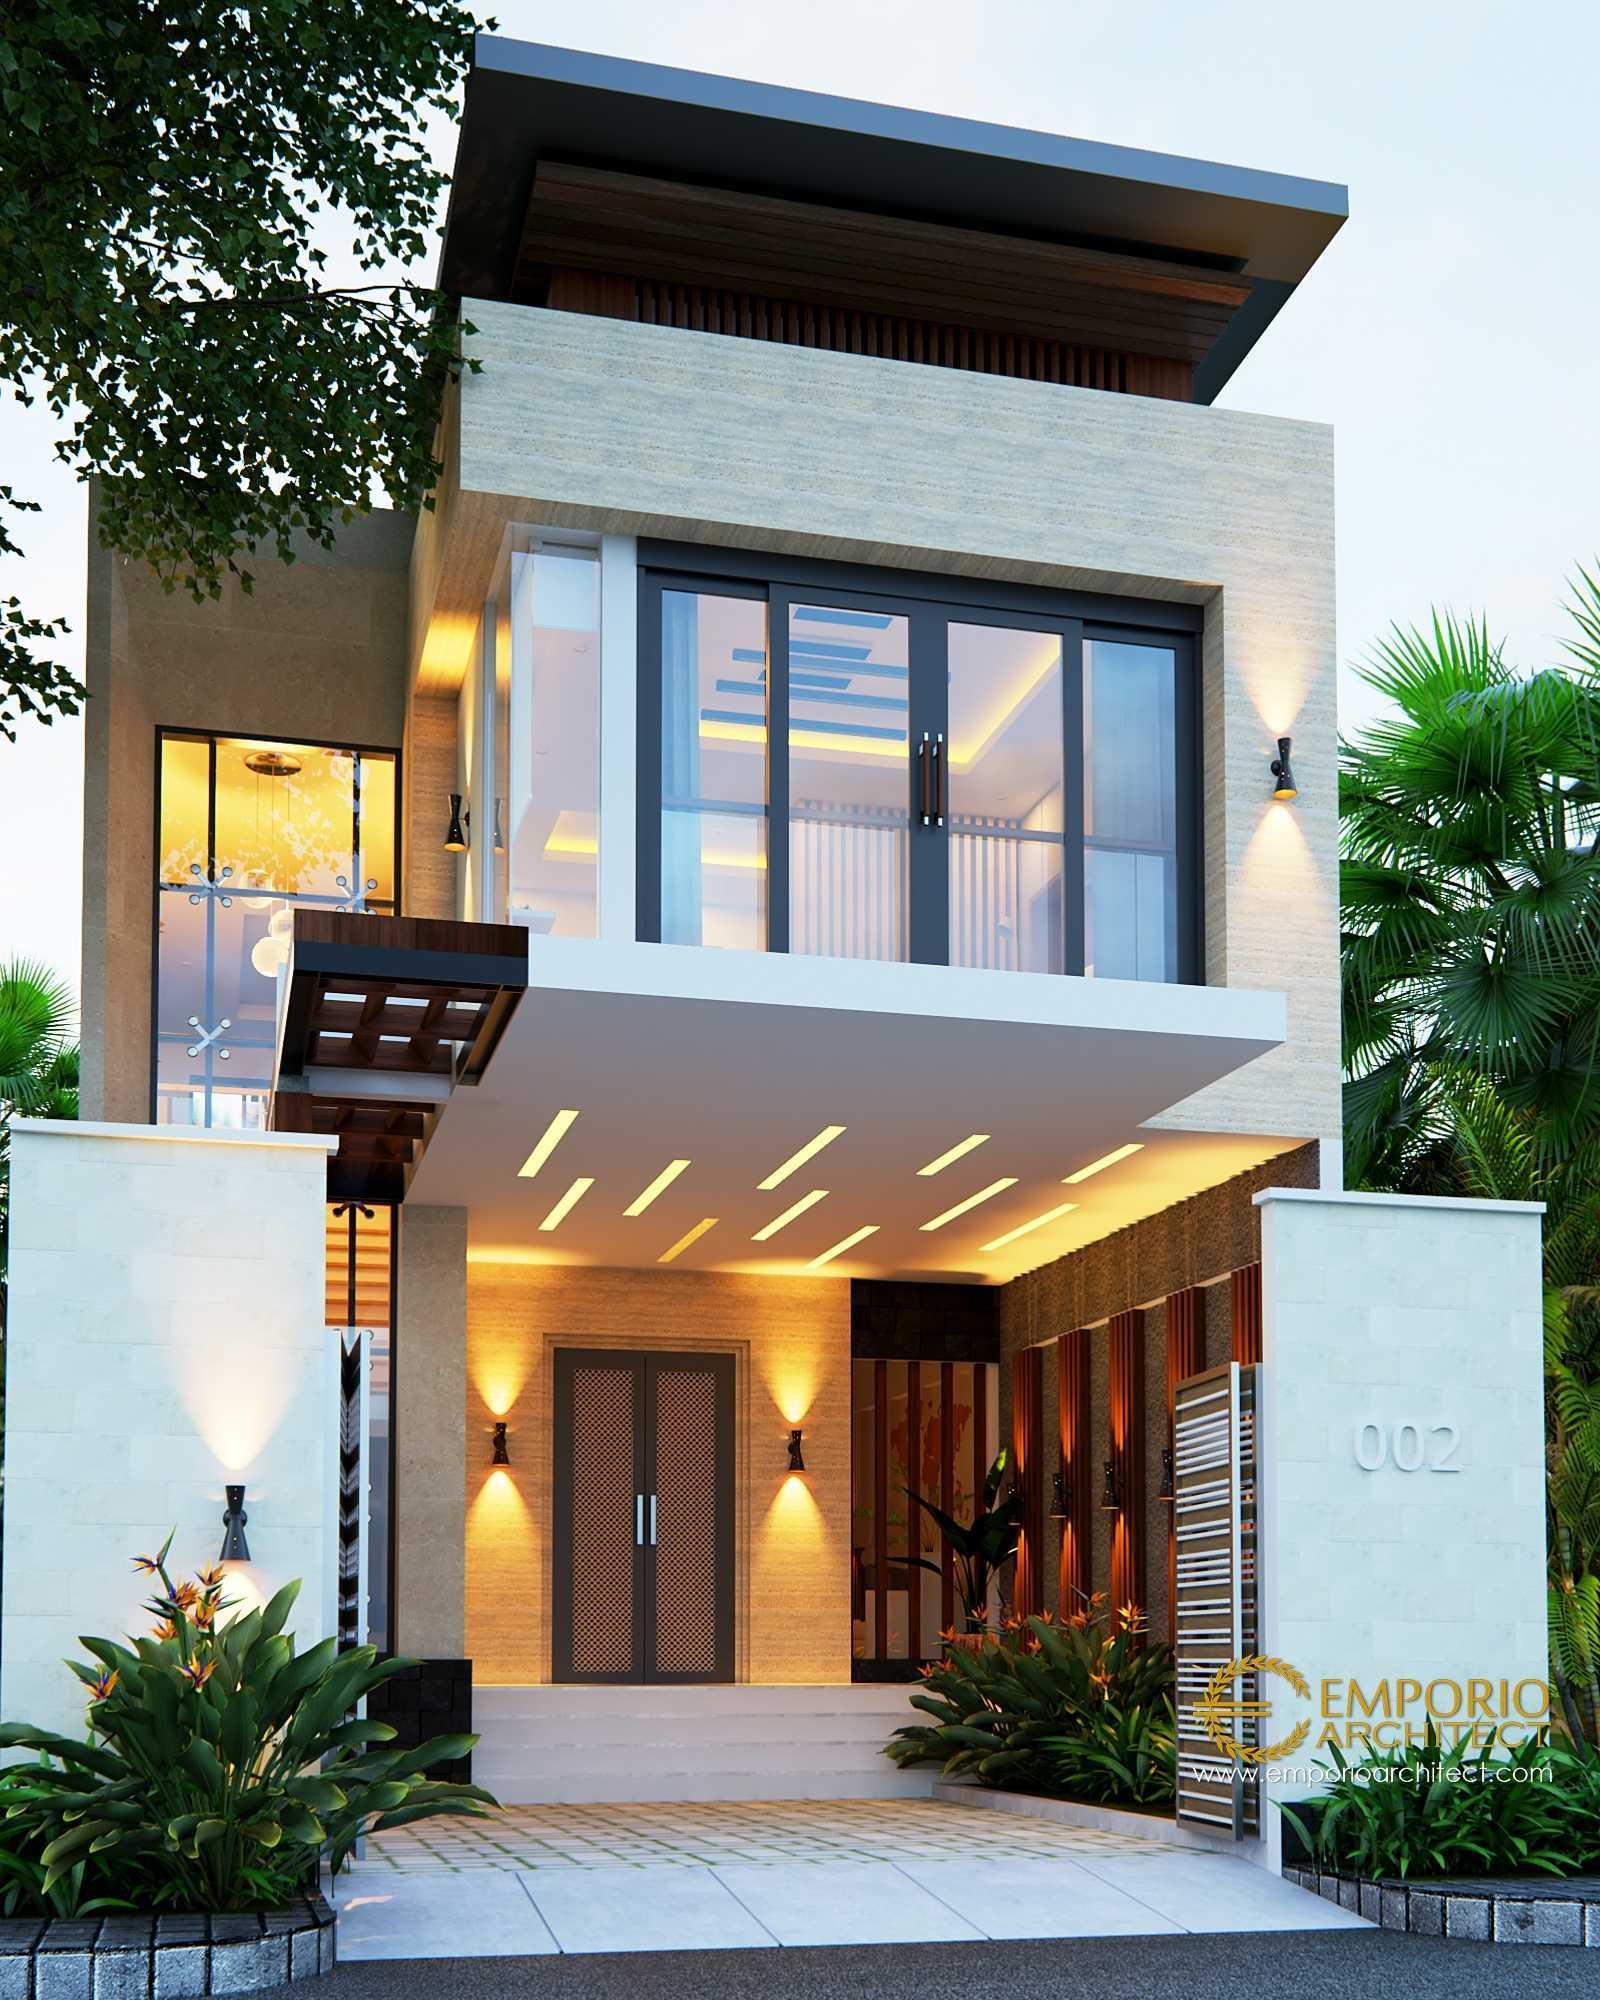 Emporio Architect Desain Rumah Modern Tropis 484 @ Sumatera Utara Sumatera Utara, Indonesia Sumatera Utara, Indonesia Emporio-Architect-Desain-Rumah-Modern-Tropis-484-Sumatera-Utara Tropical  77230